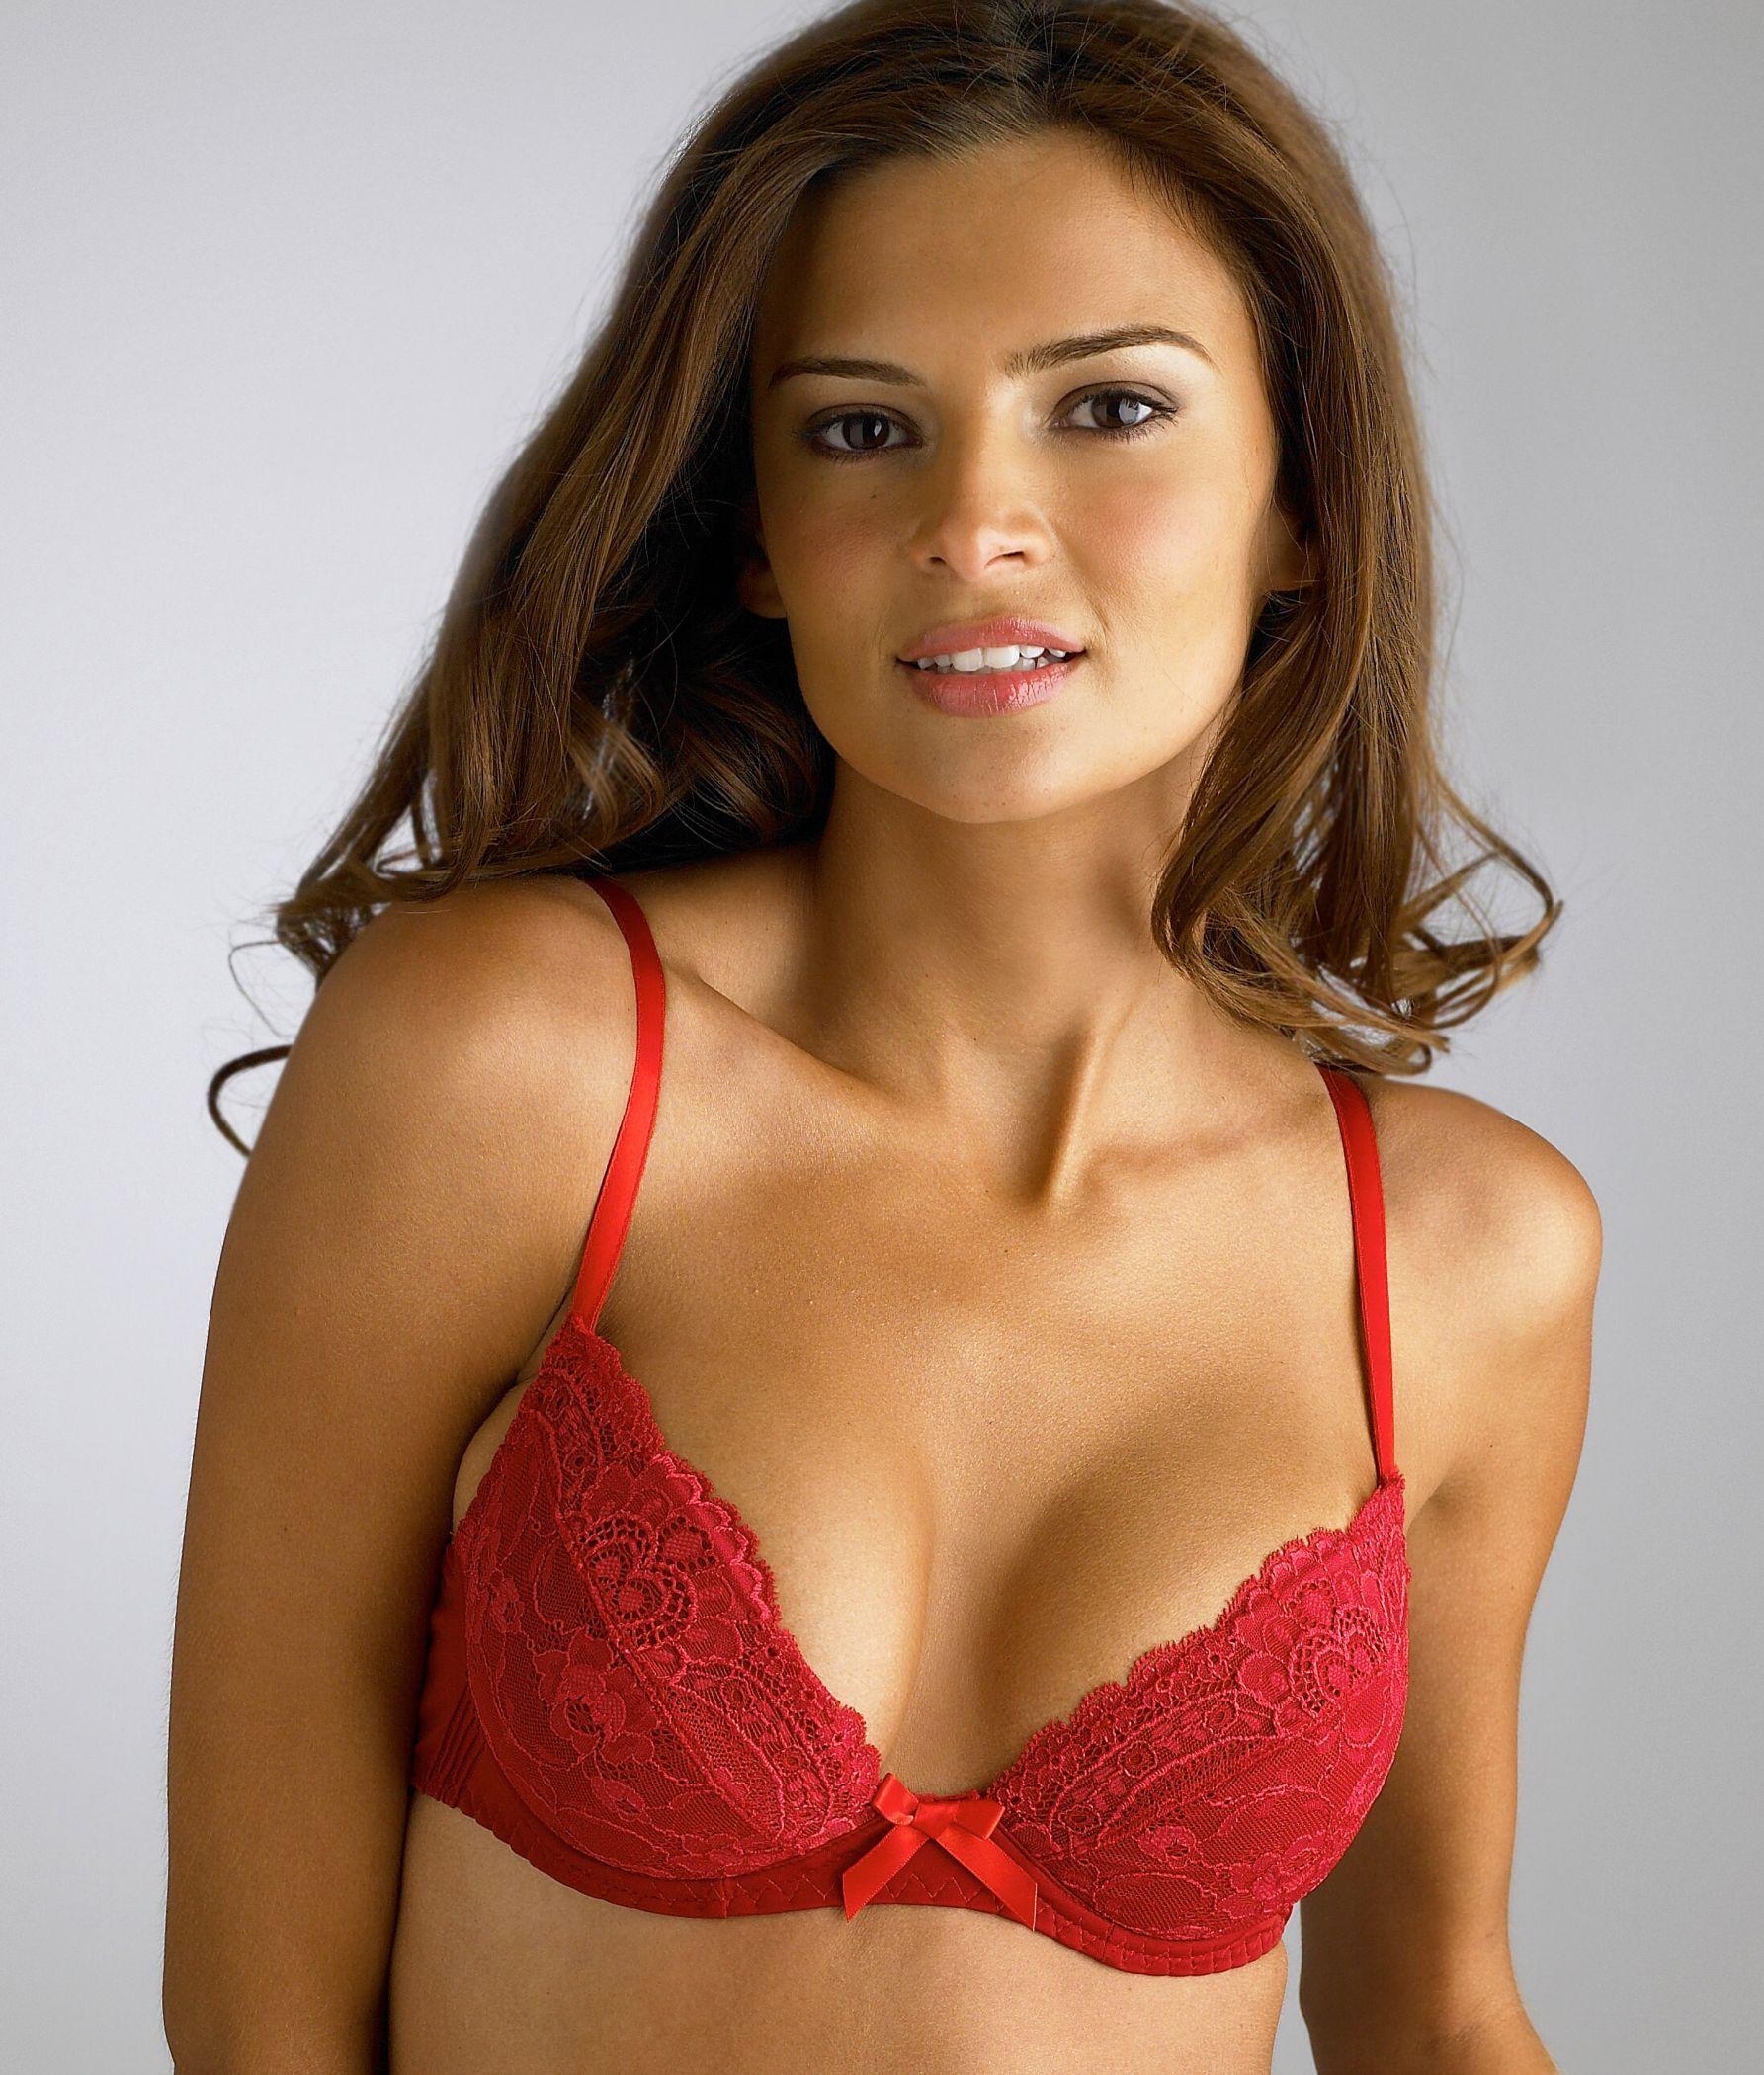 Jennifer Lamiraqui  d8cac5e4c21d4